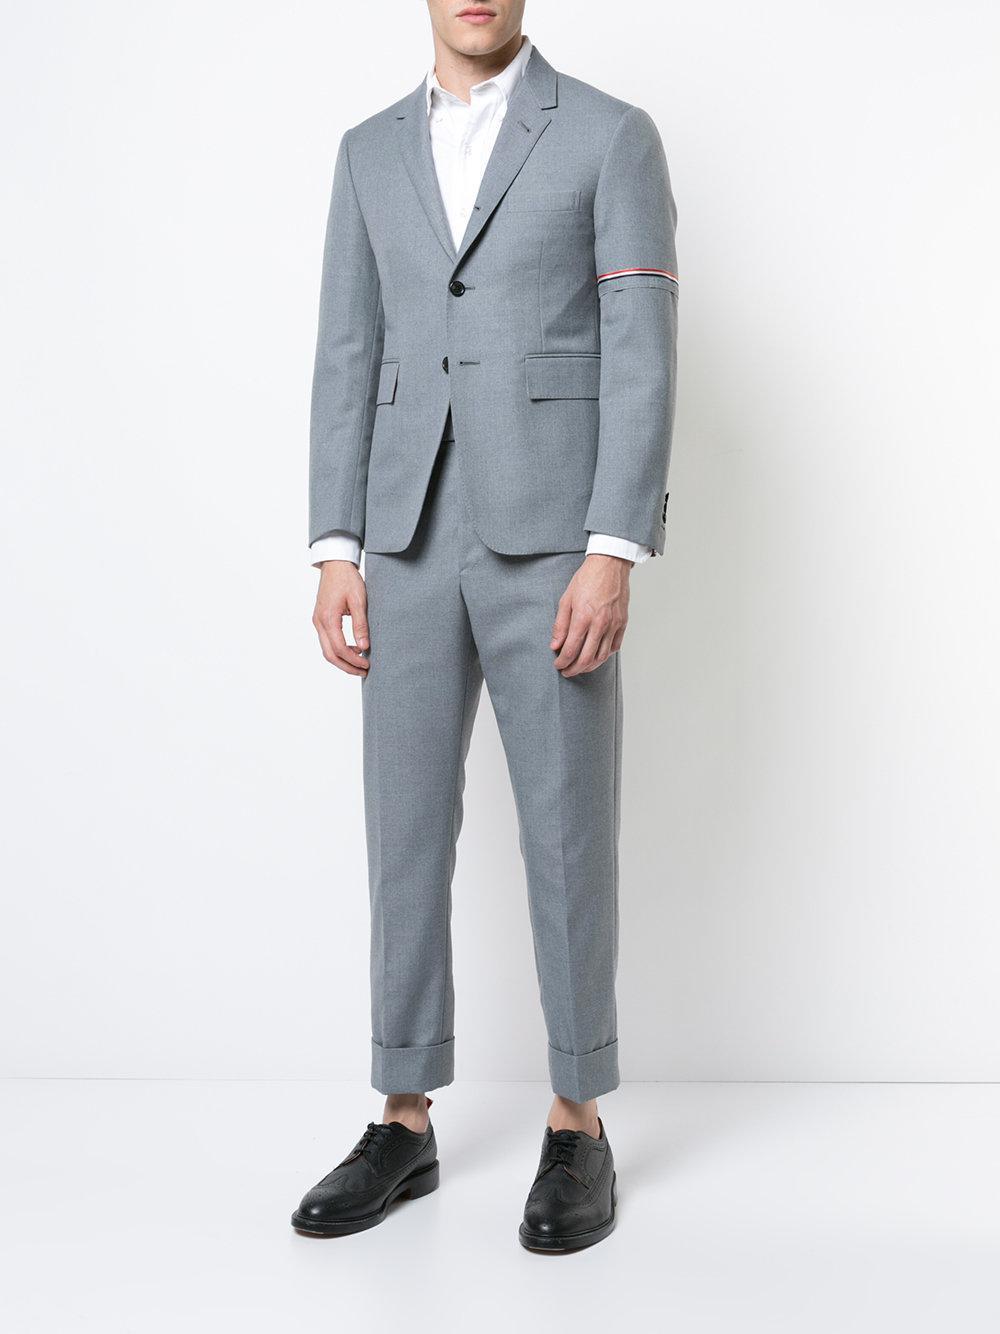 573c5f93301 Lyst - Thom Browne Classic Backstrap Trouser W  Rwb Selvedge Placement In  School Uniform Twill in Gray for Men